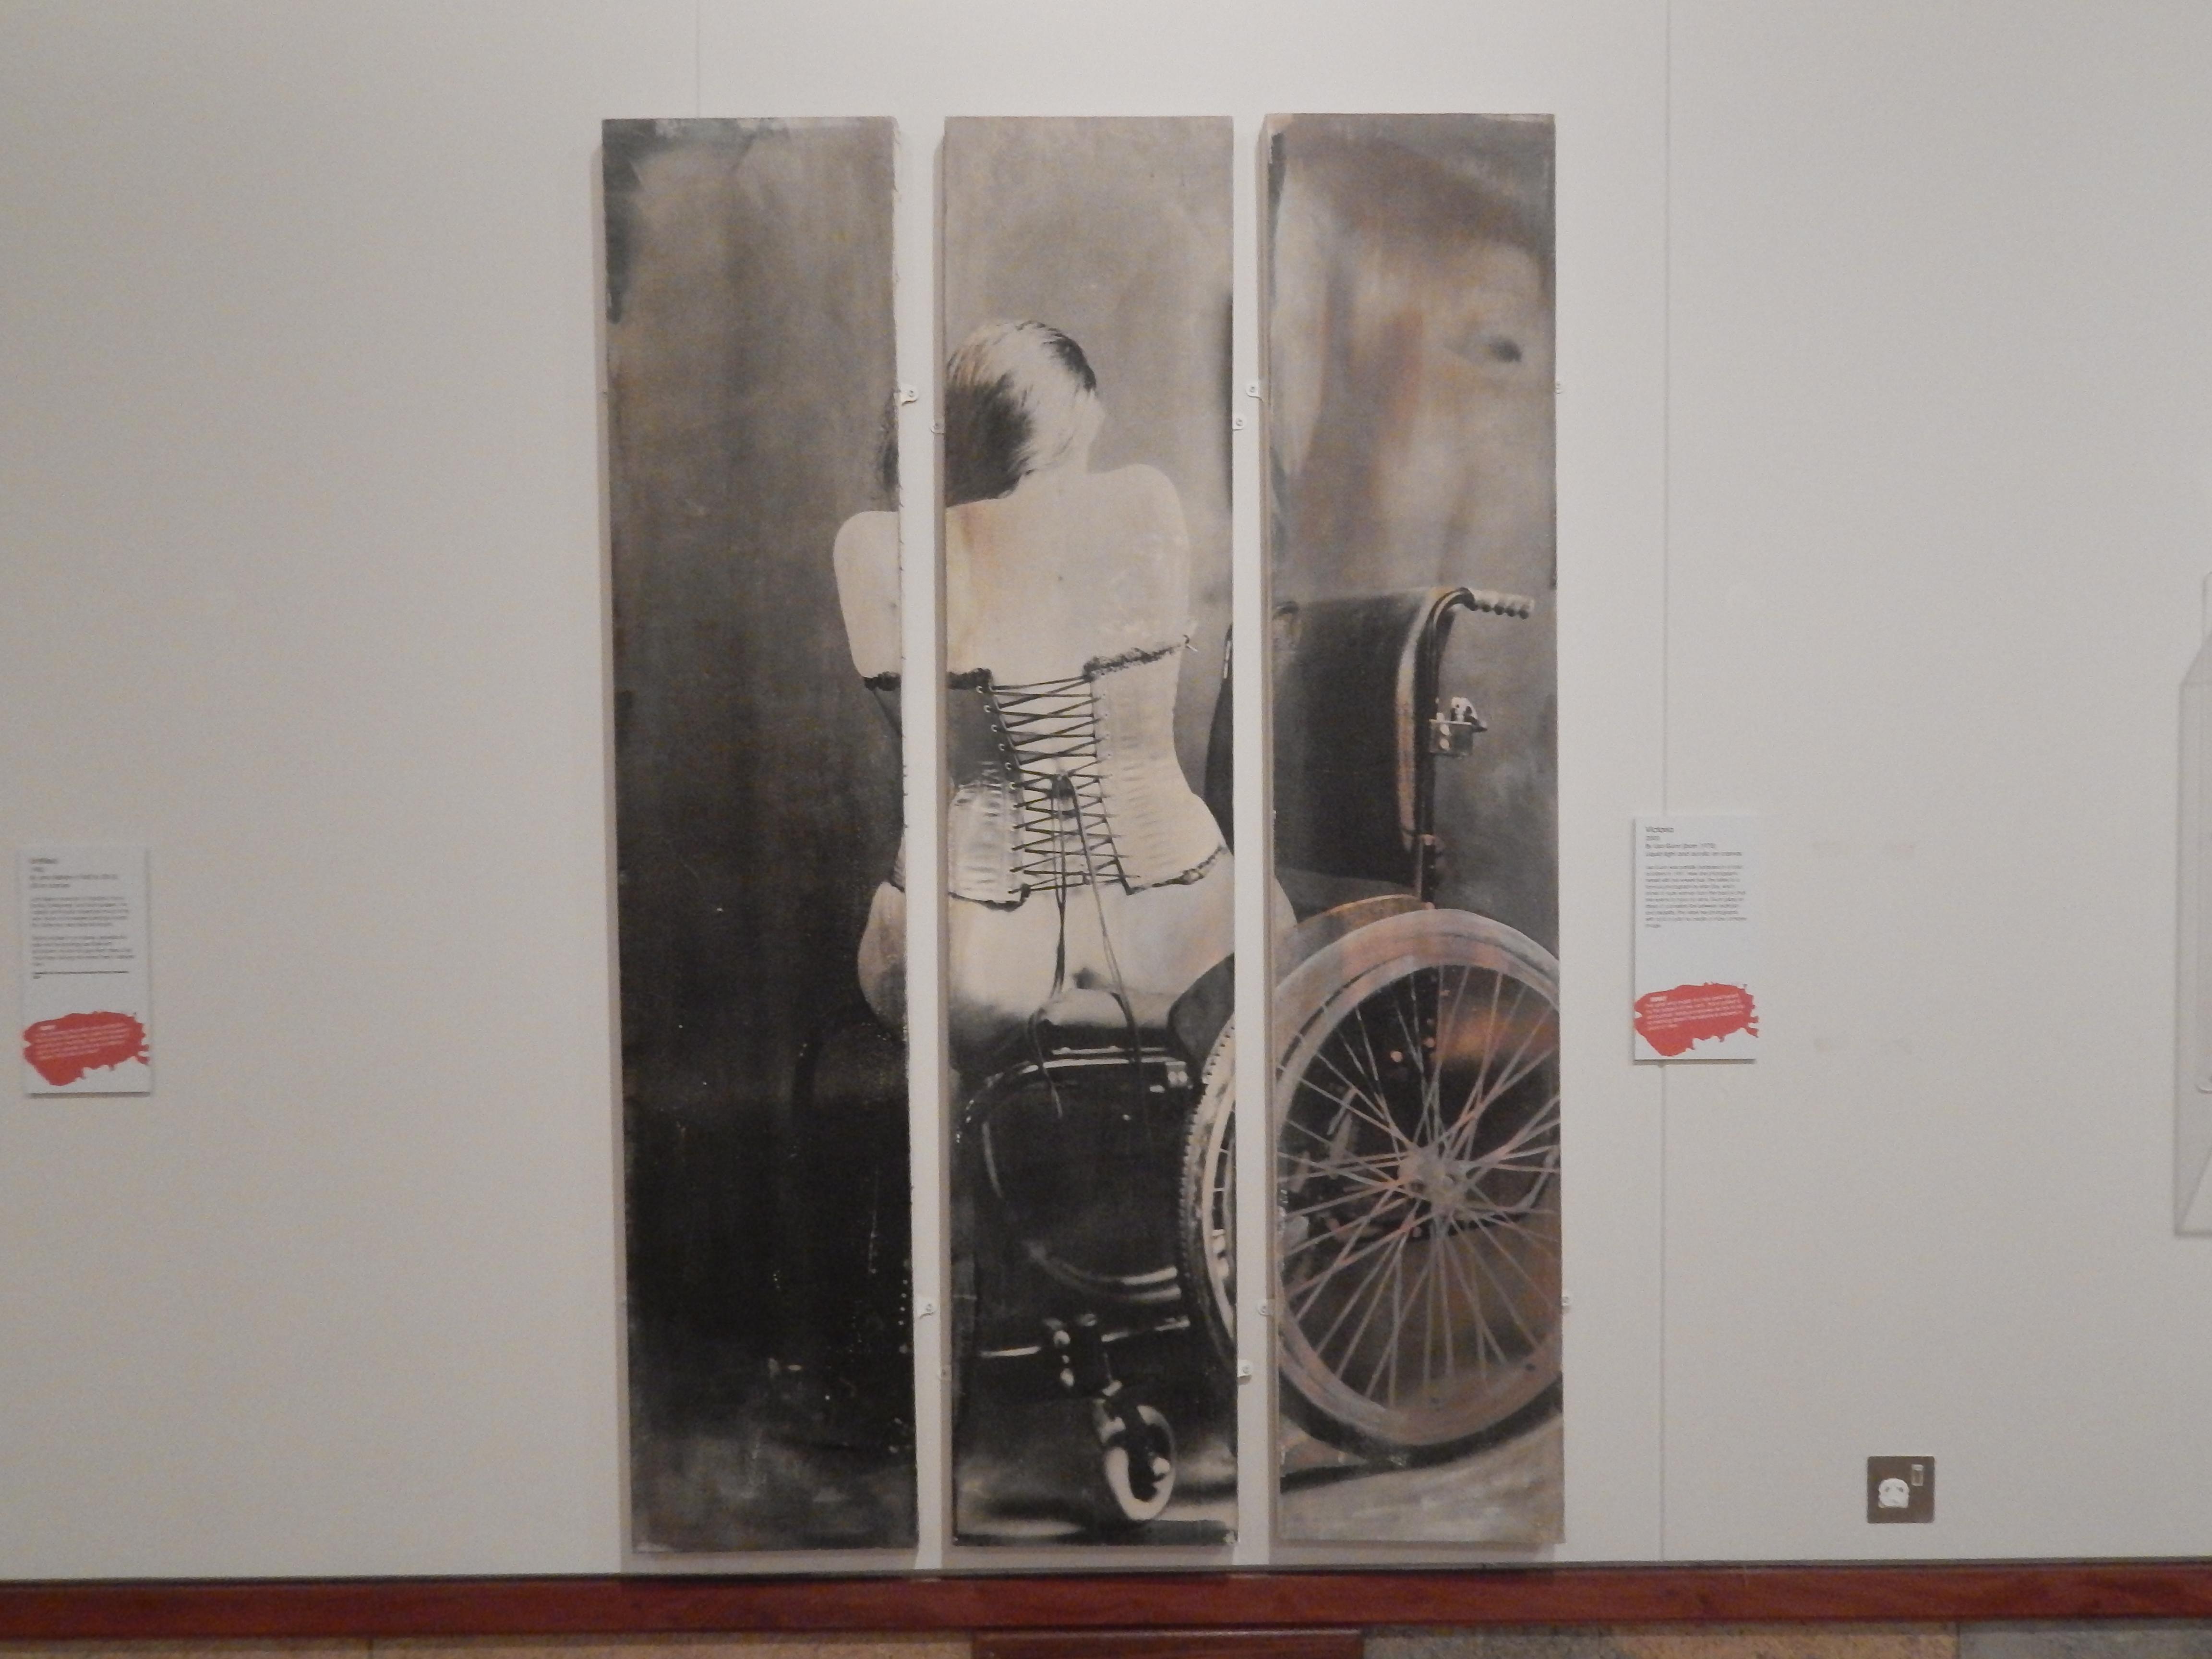 herbert art gallery and museum coventry